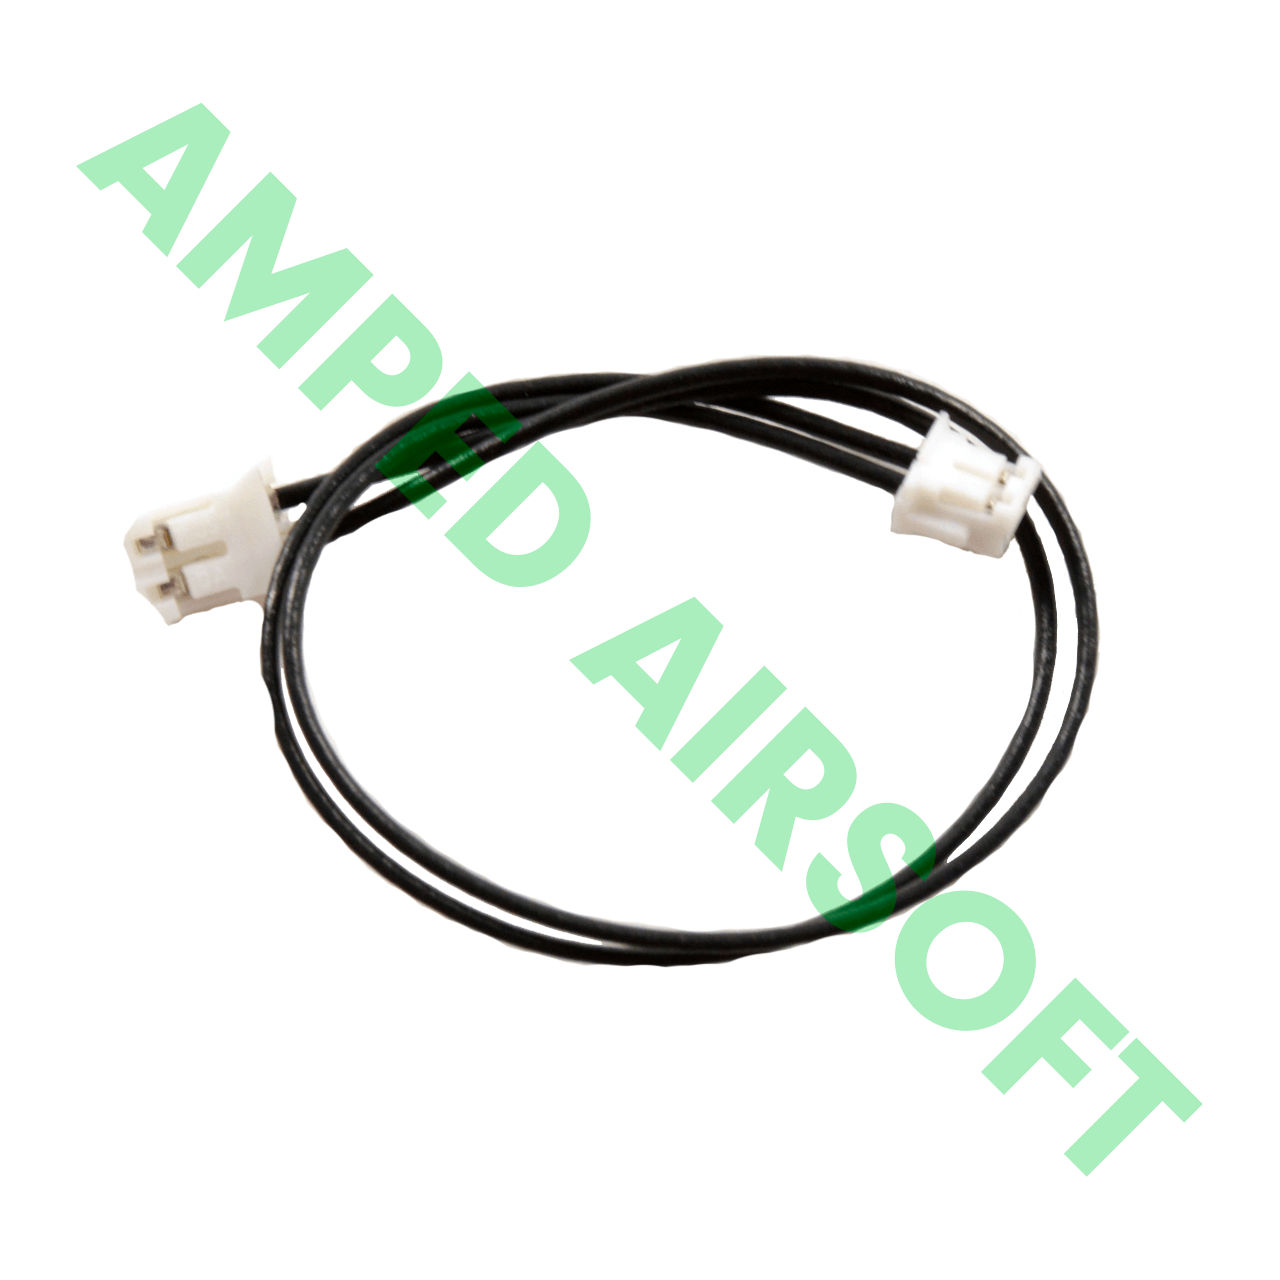 hight resolution of  ferrari 360 f1 transmission wiring harness used pn 181343 wiring on ferrari f430 spider